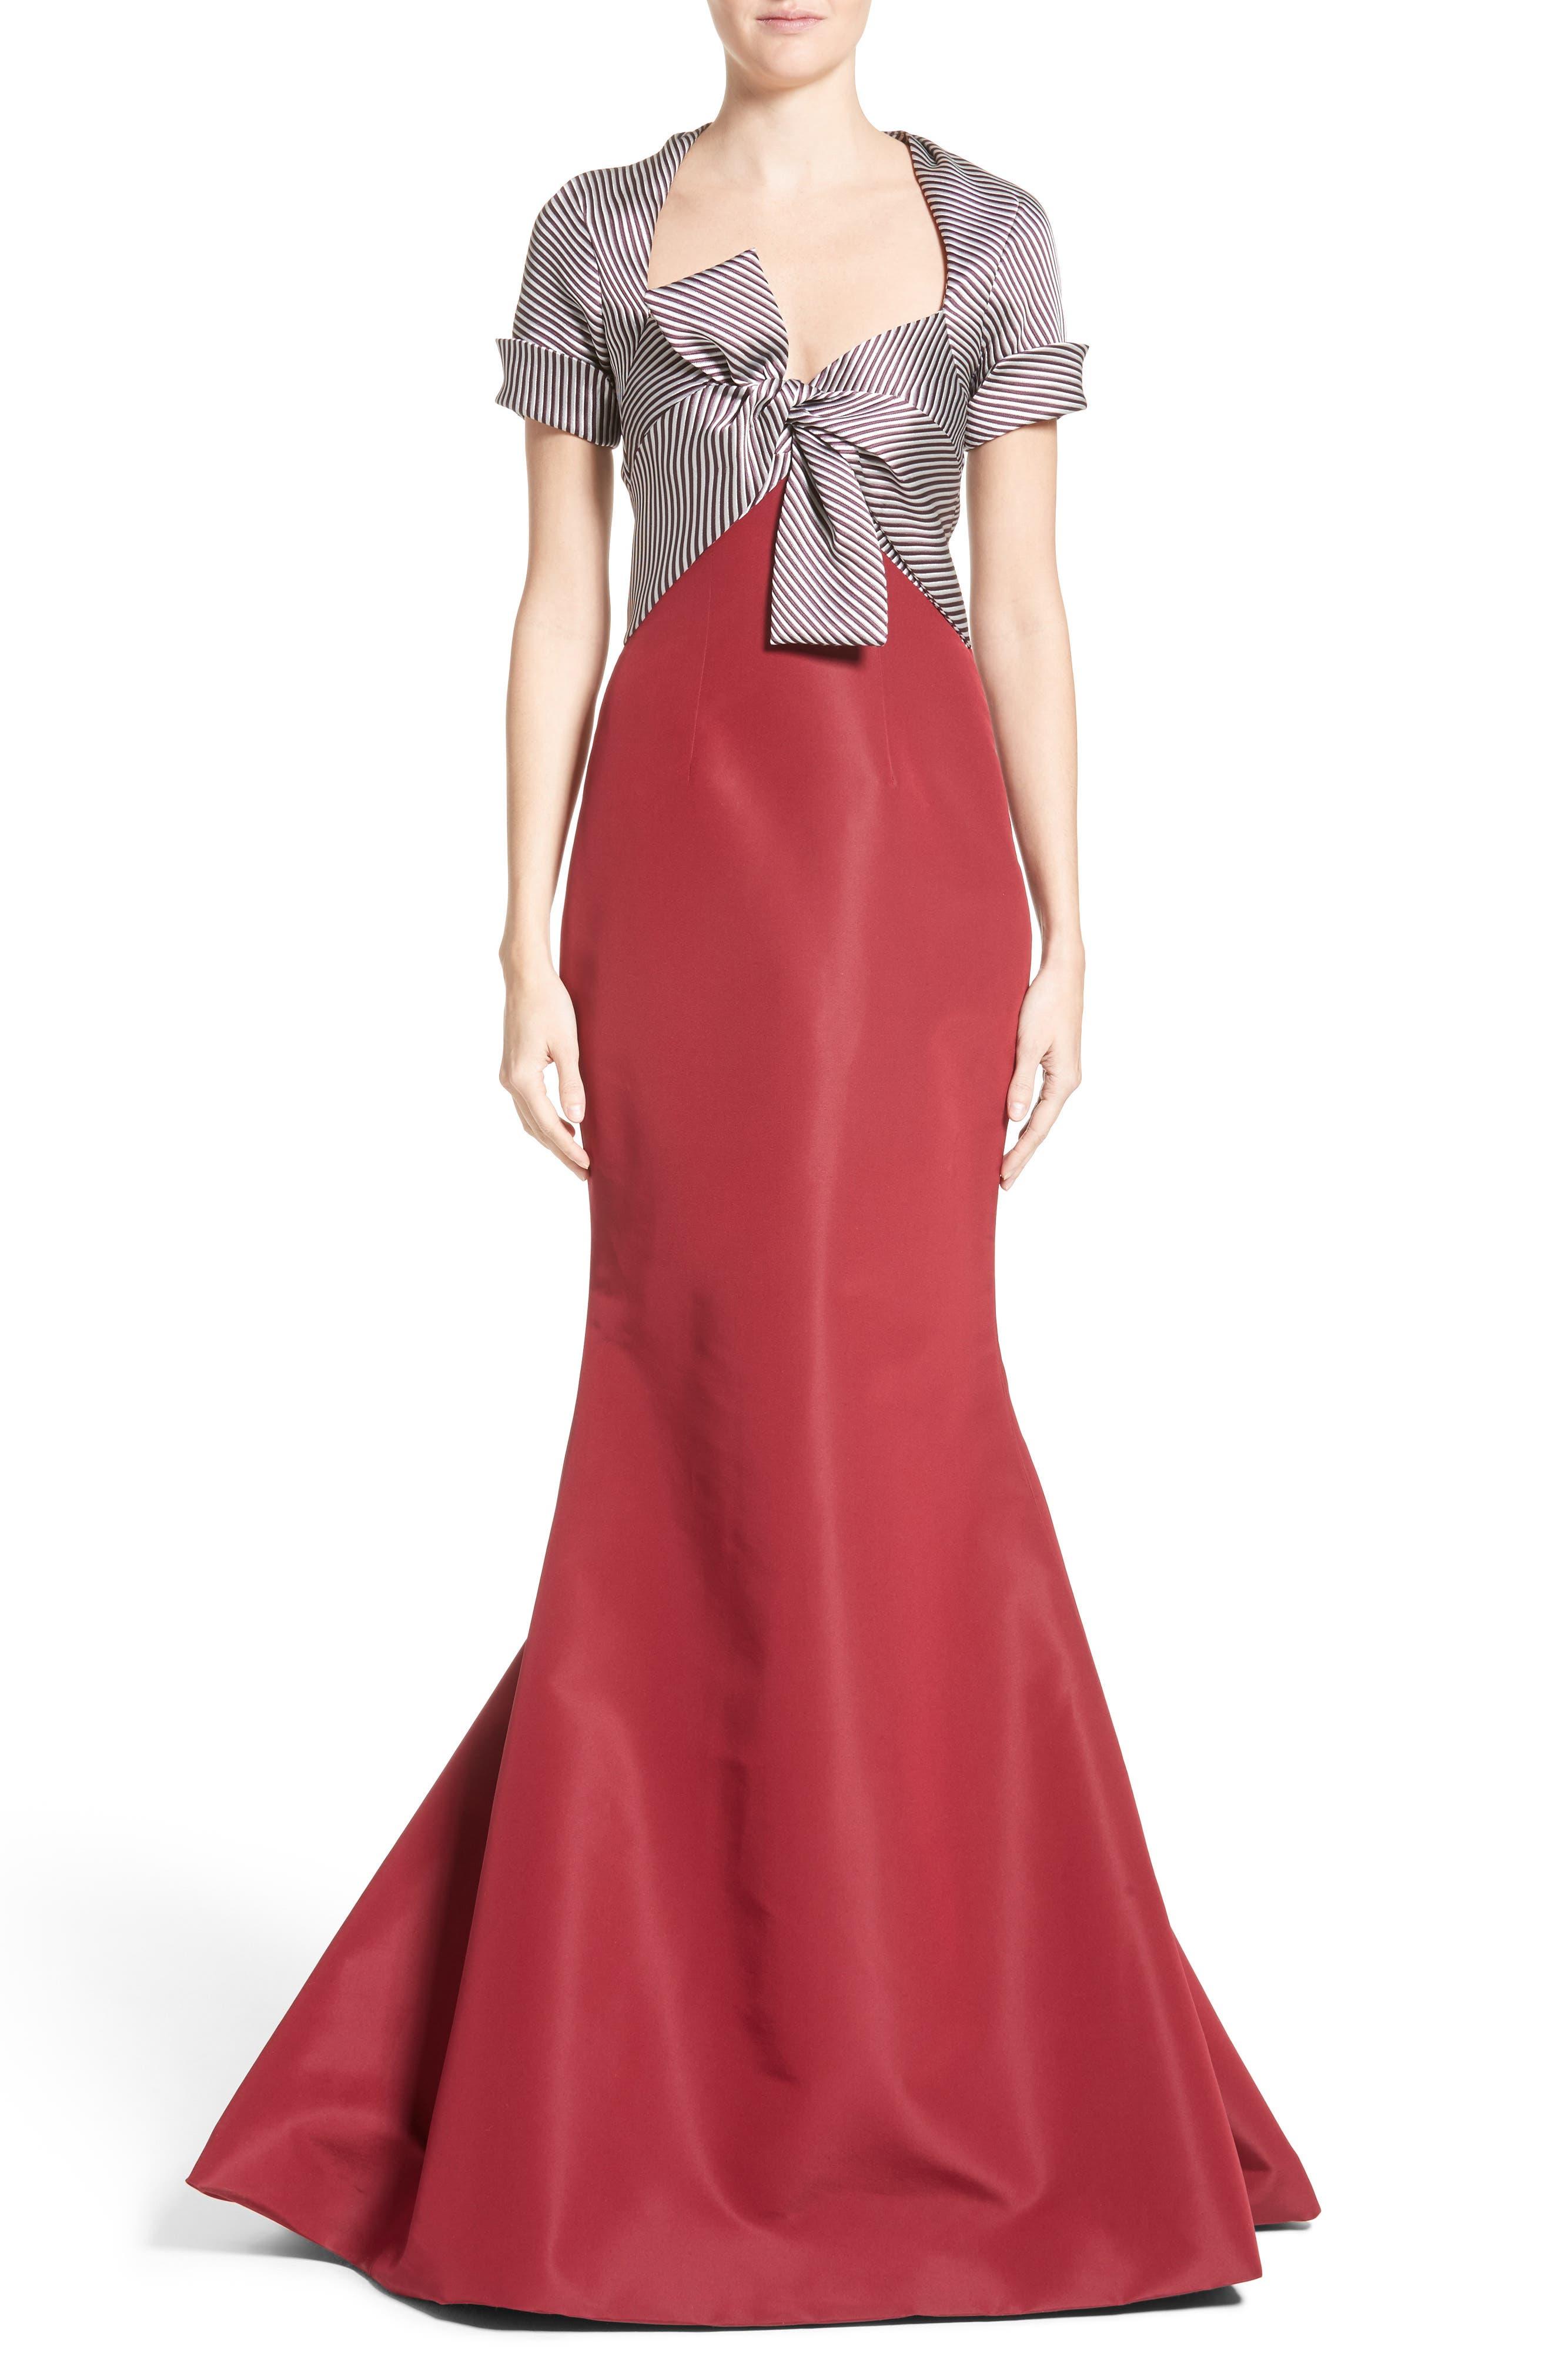 Alternate Image 1 Selected - Carolina Herrera Bow Front Colorblock Gown